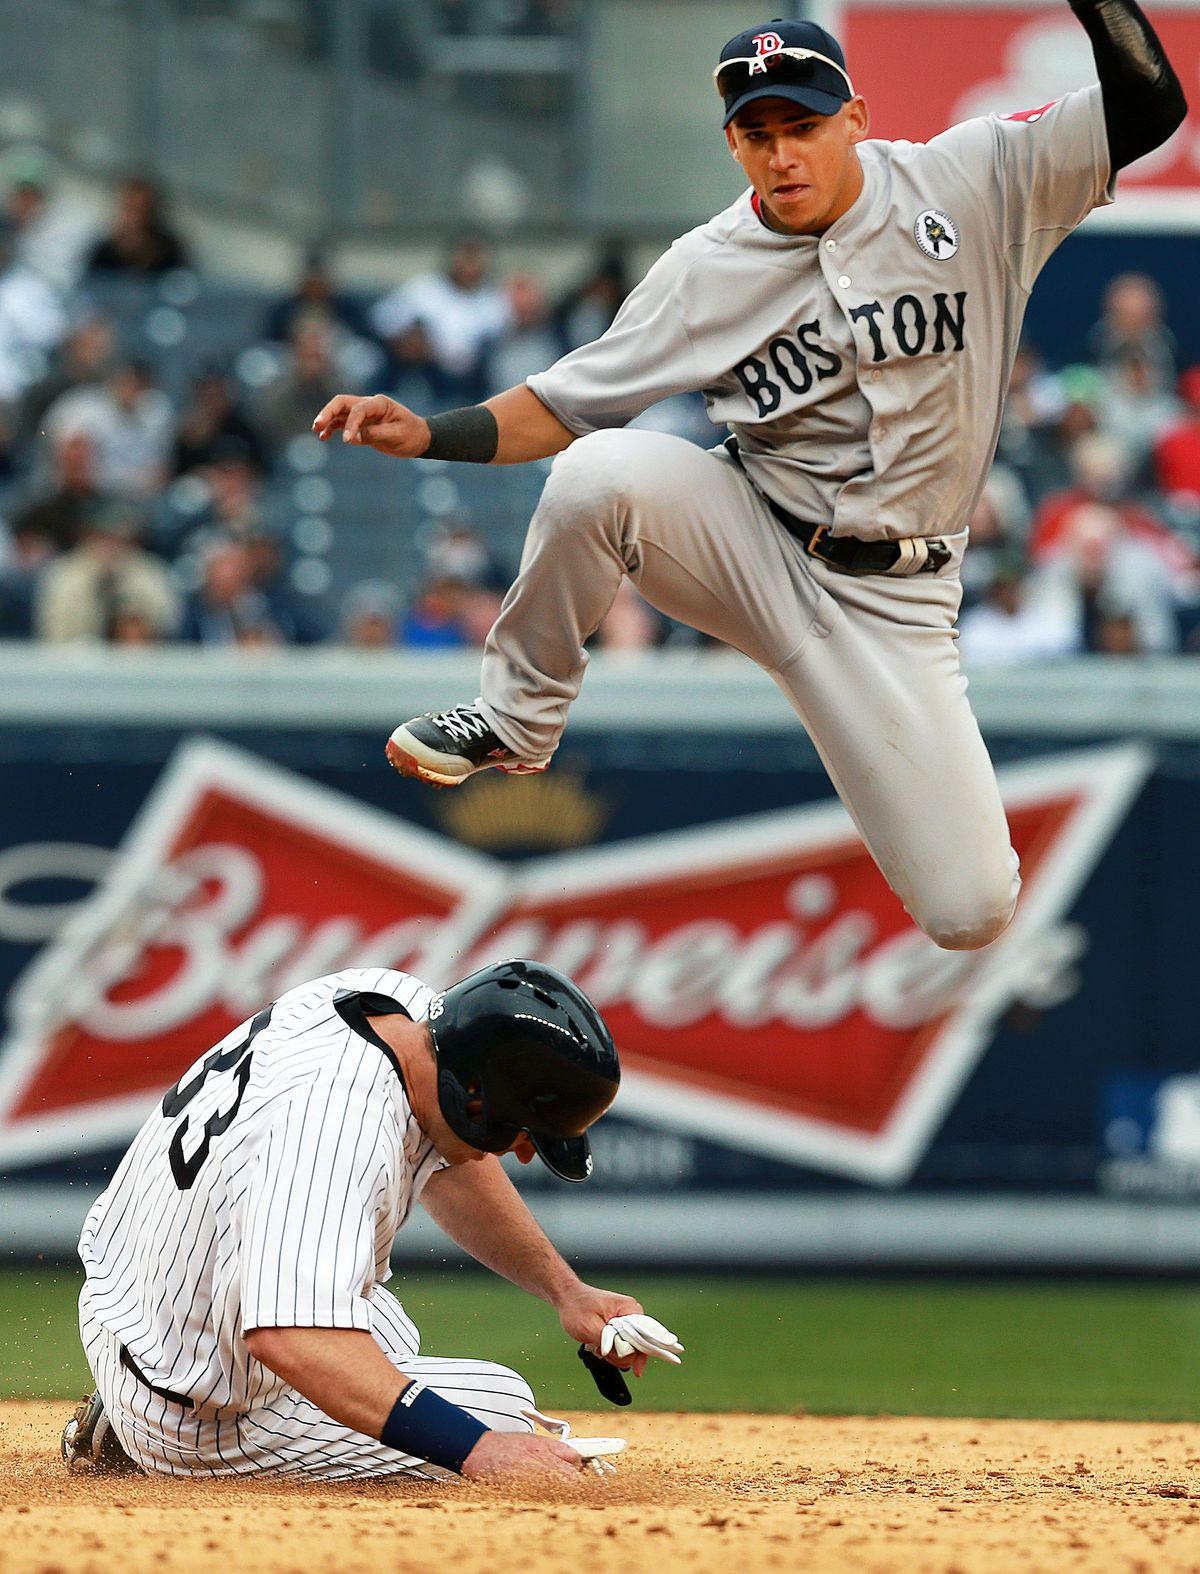 Boston Red Sox Vs. New York Yankees At Yankee Stadium